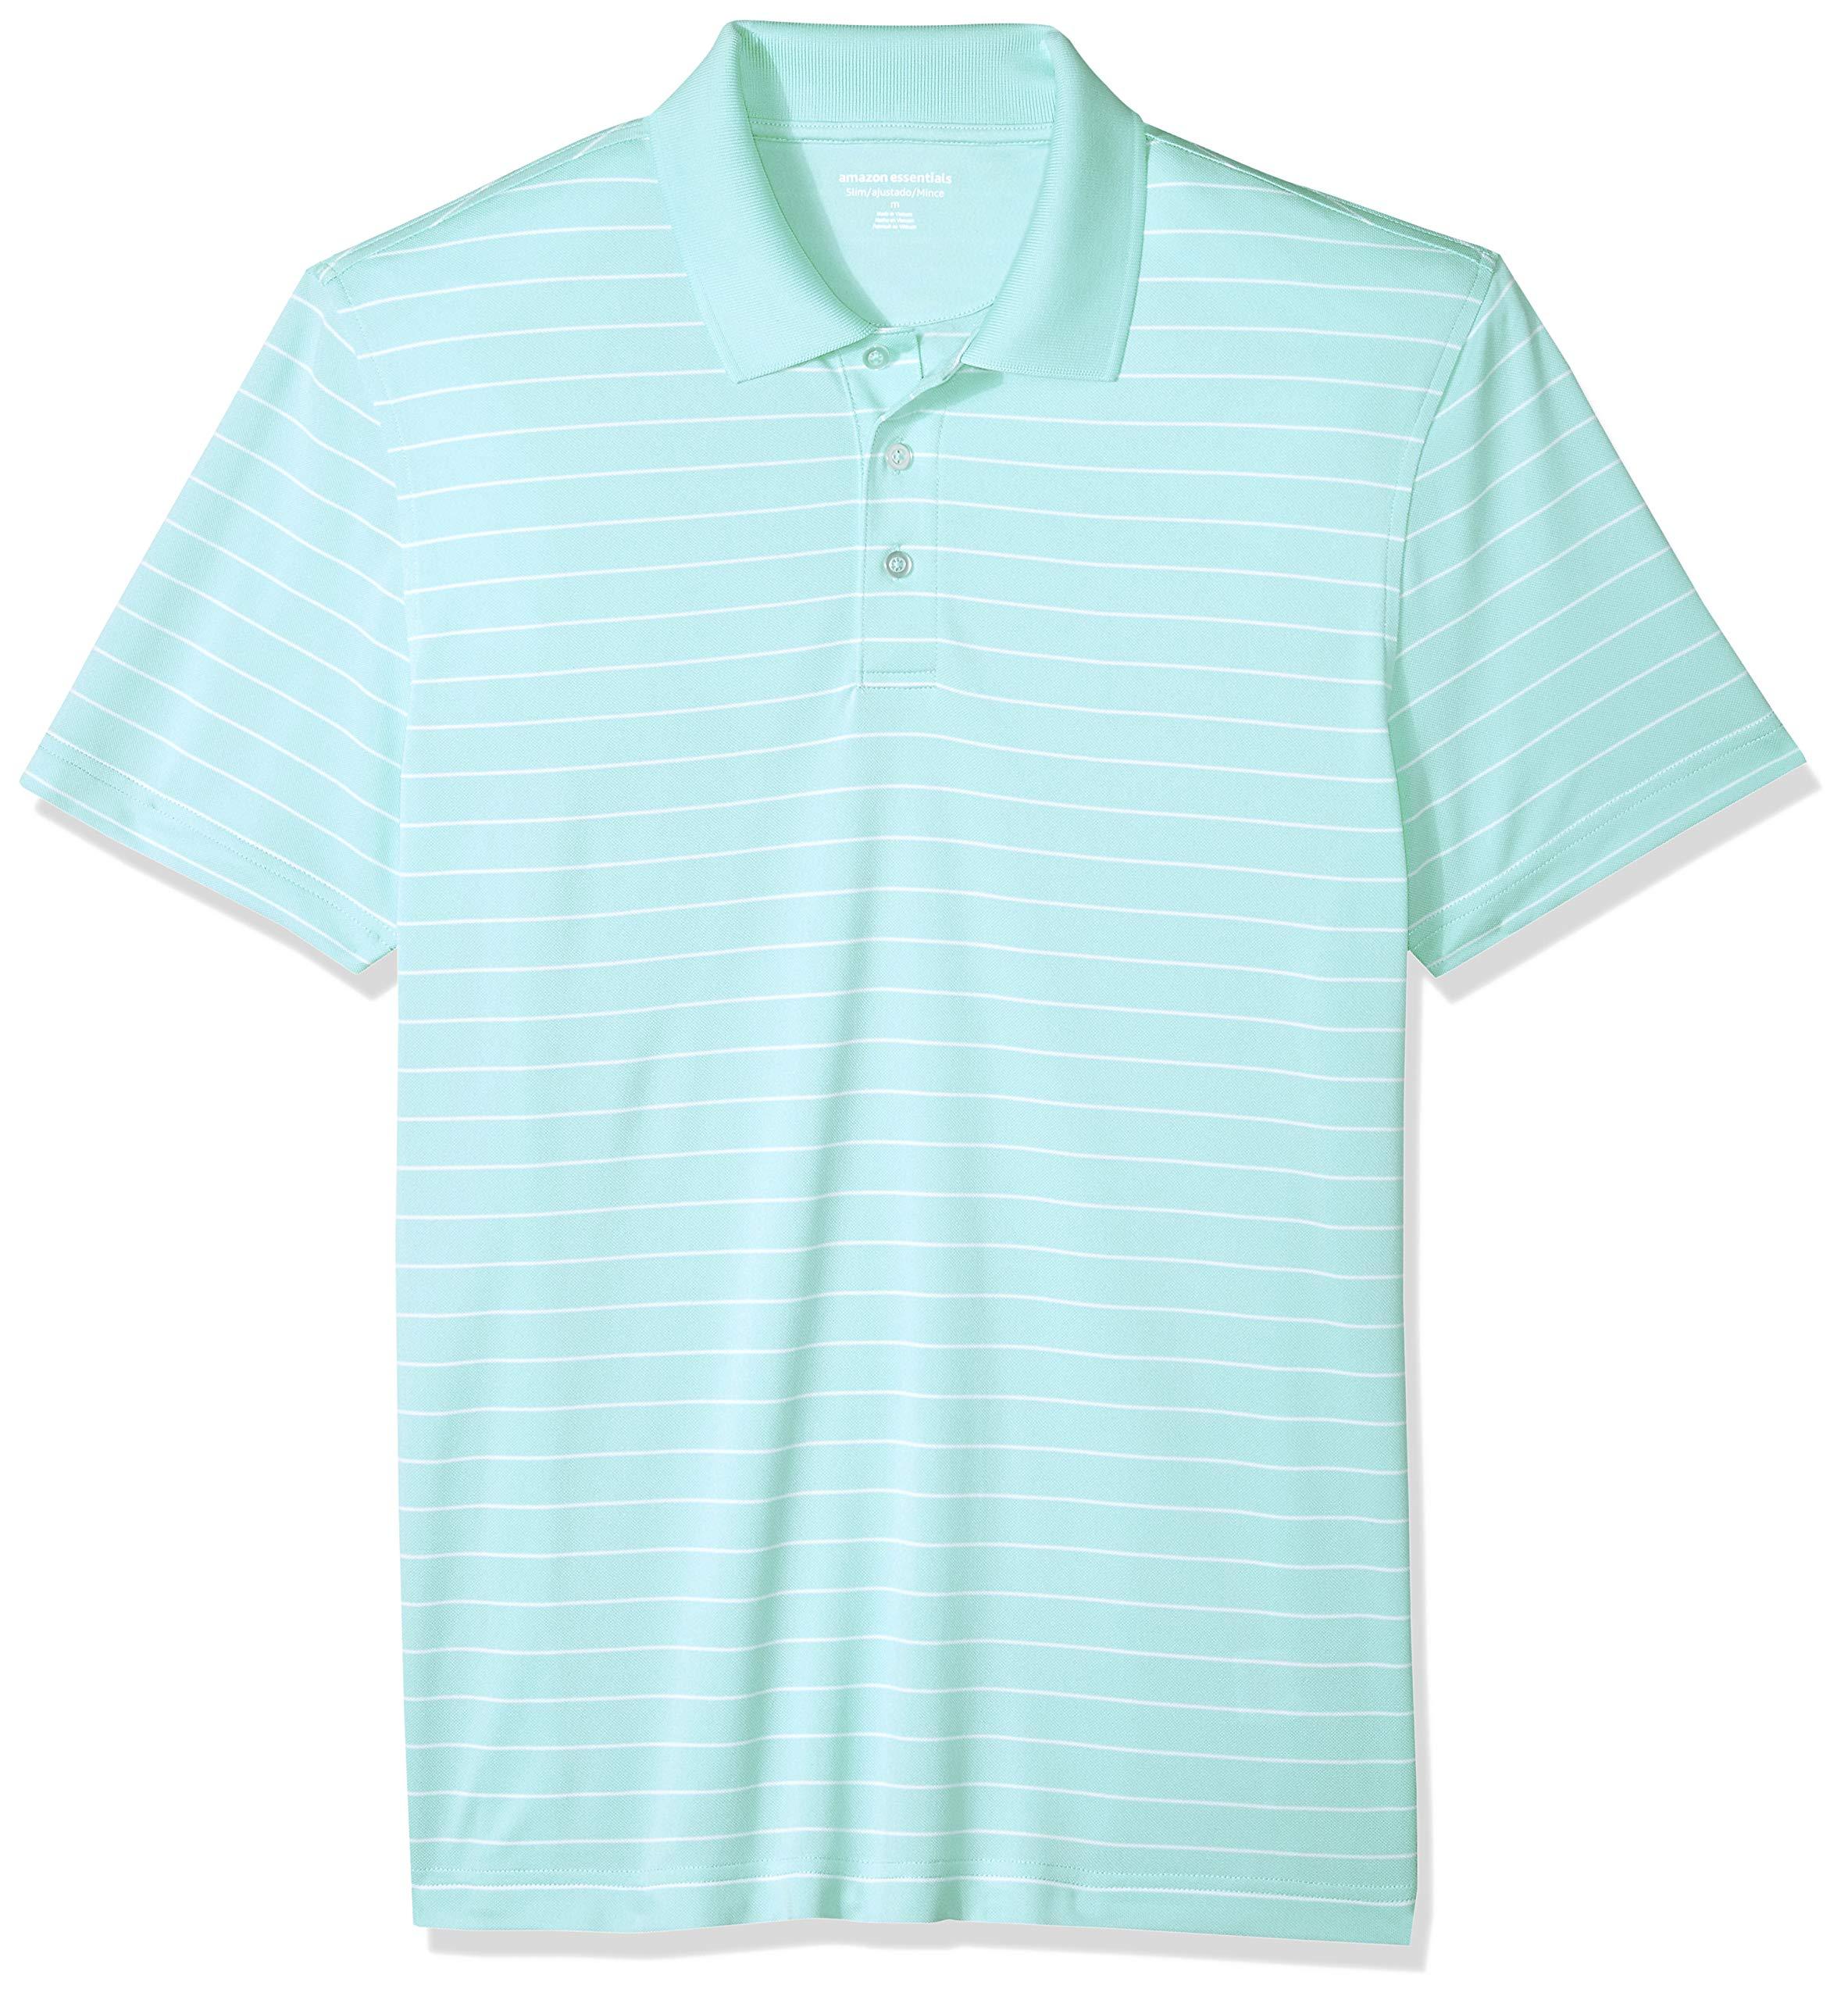 Amazon Essentials Men's Slim-Fit Quick-Dry Golf Polo Shirt, Aqua Stripe, X-Large by Amazon Essentials